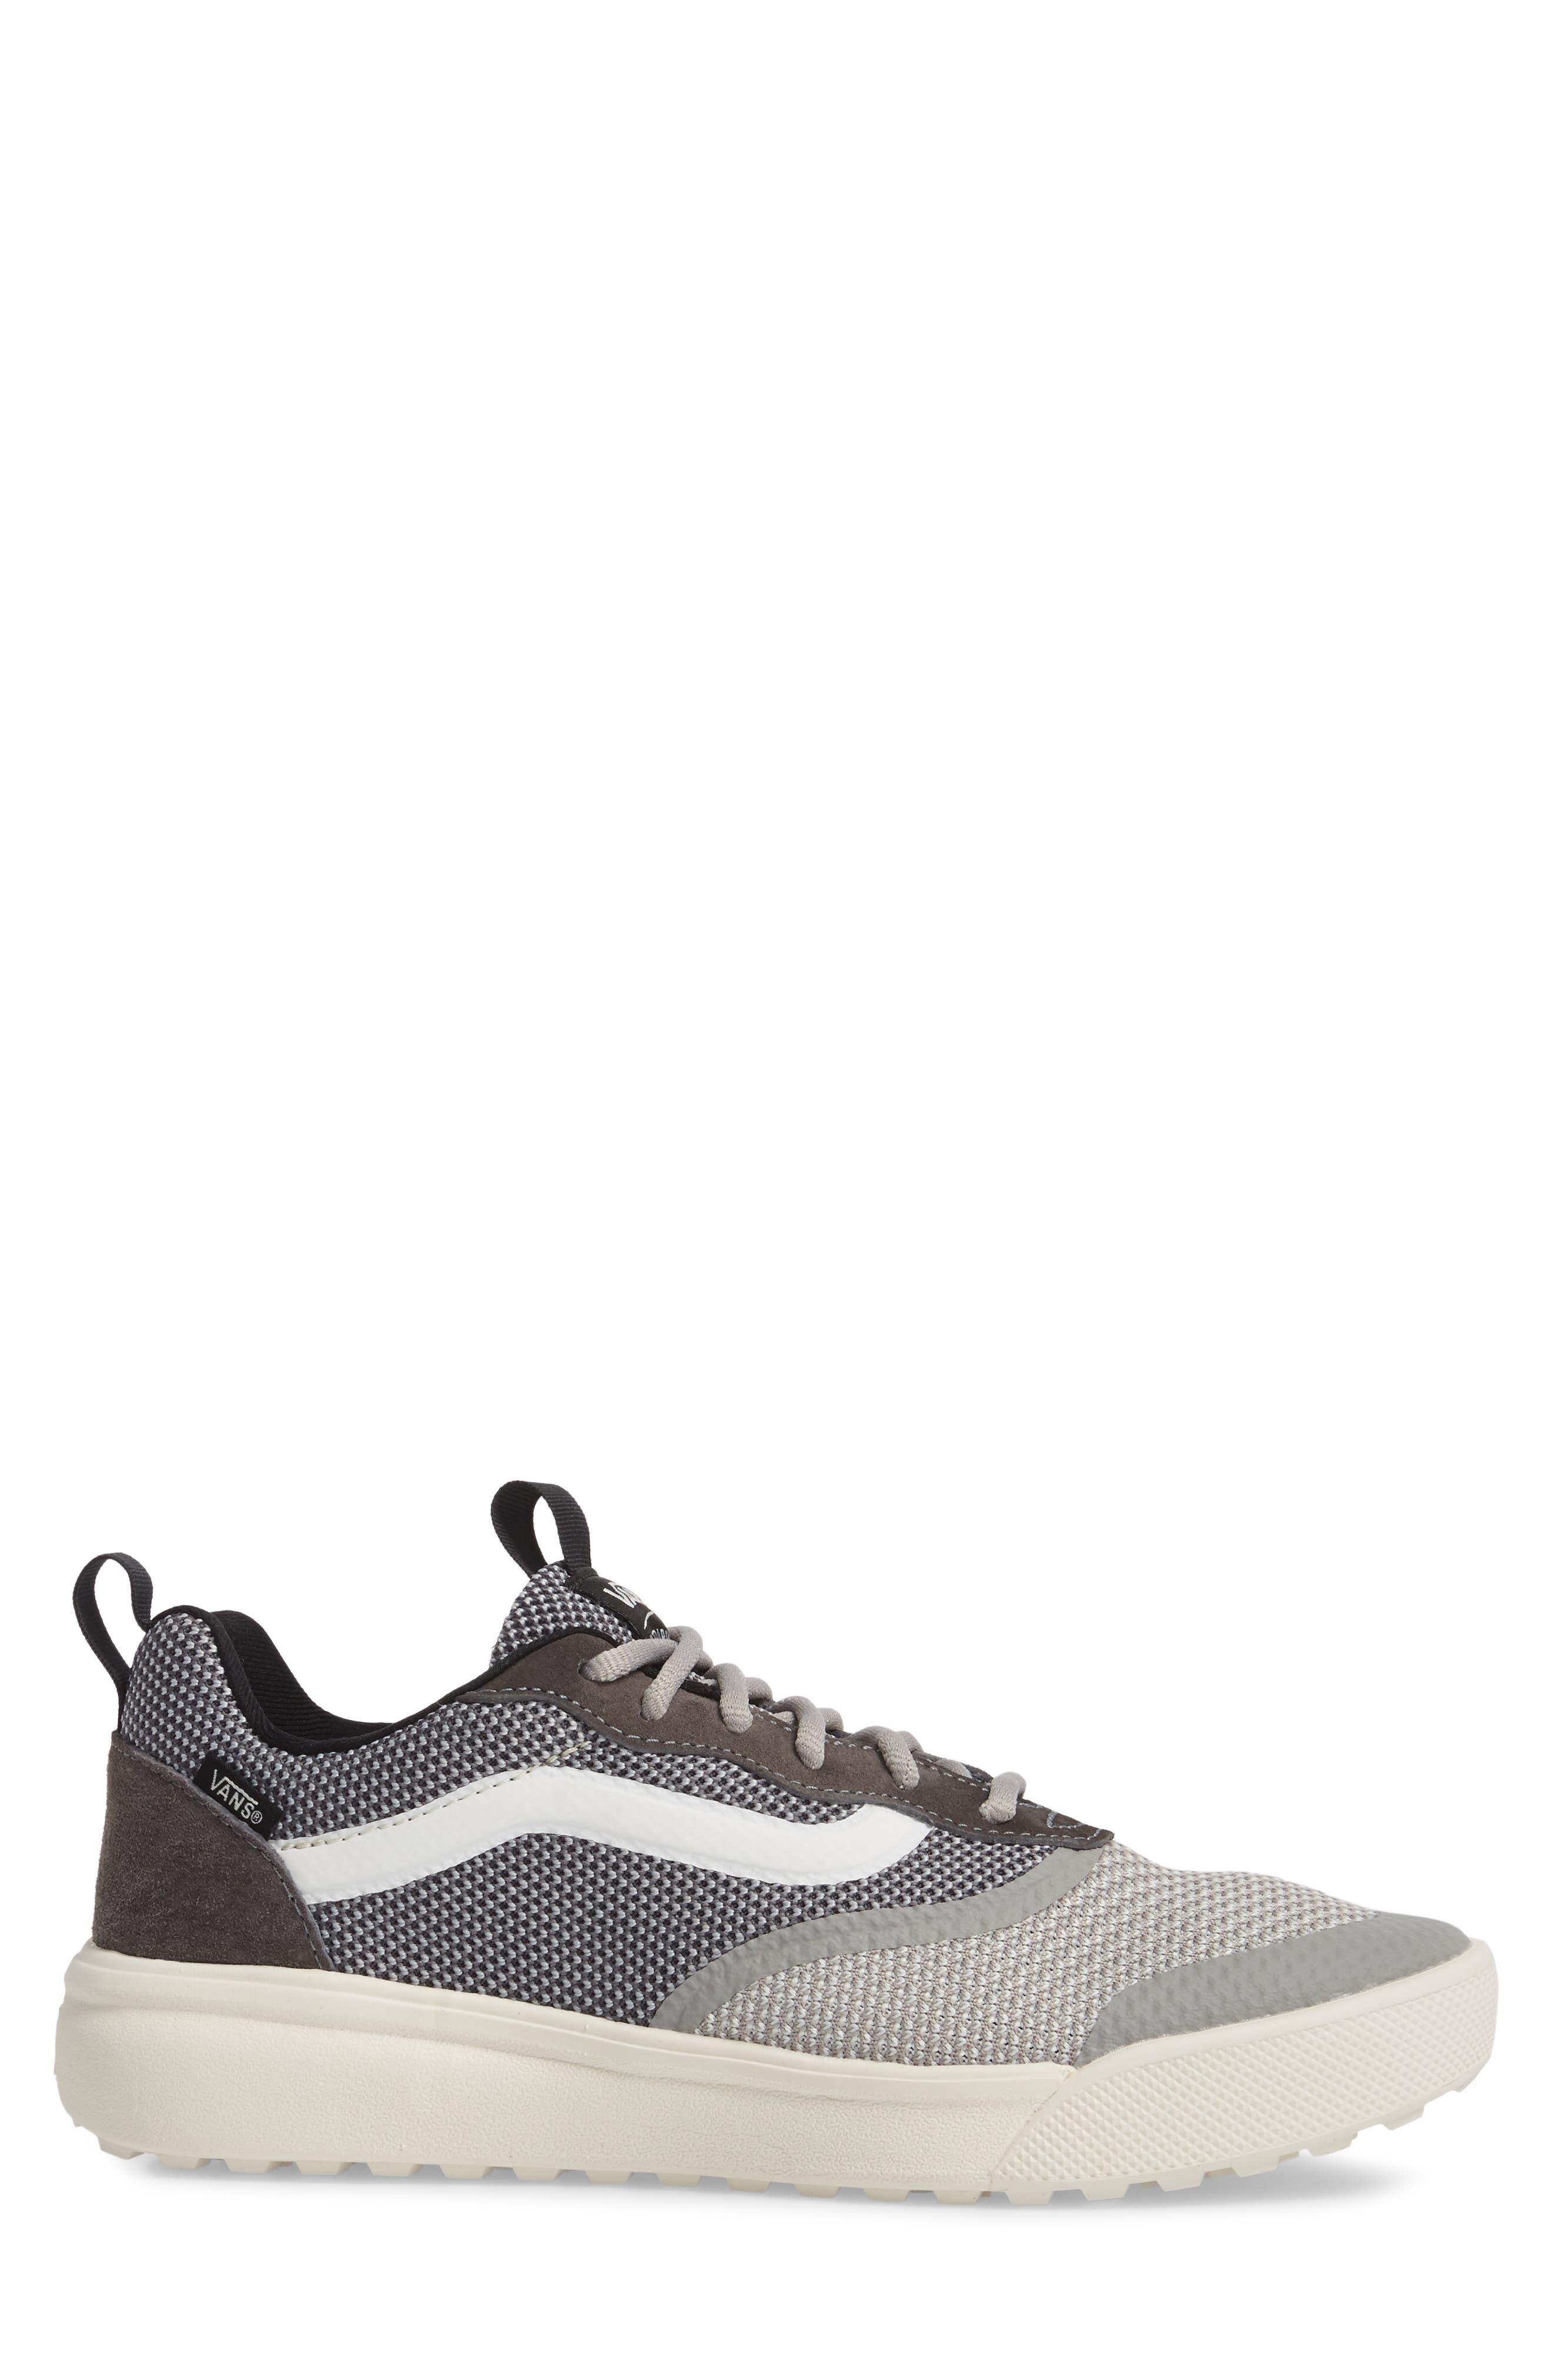 UltraRange DX Low Top Sneaker,                             Alternate thumbnail 3, color,